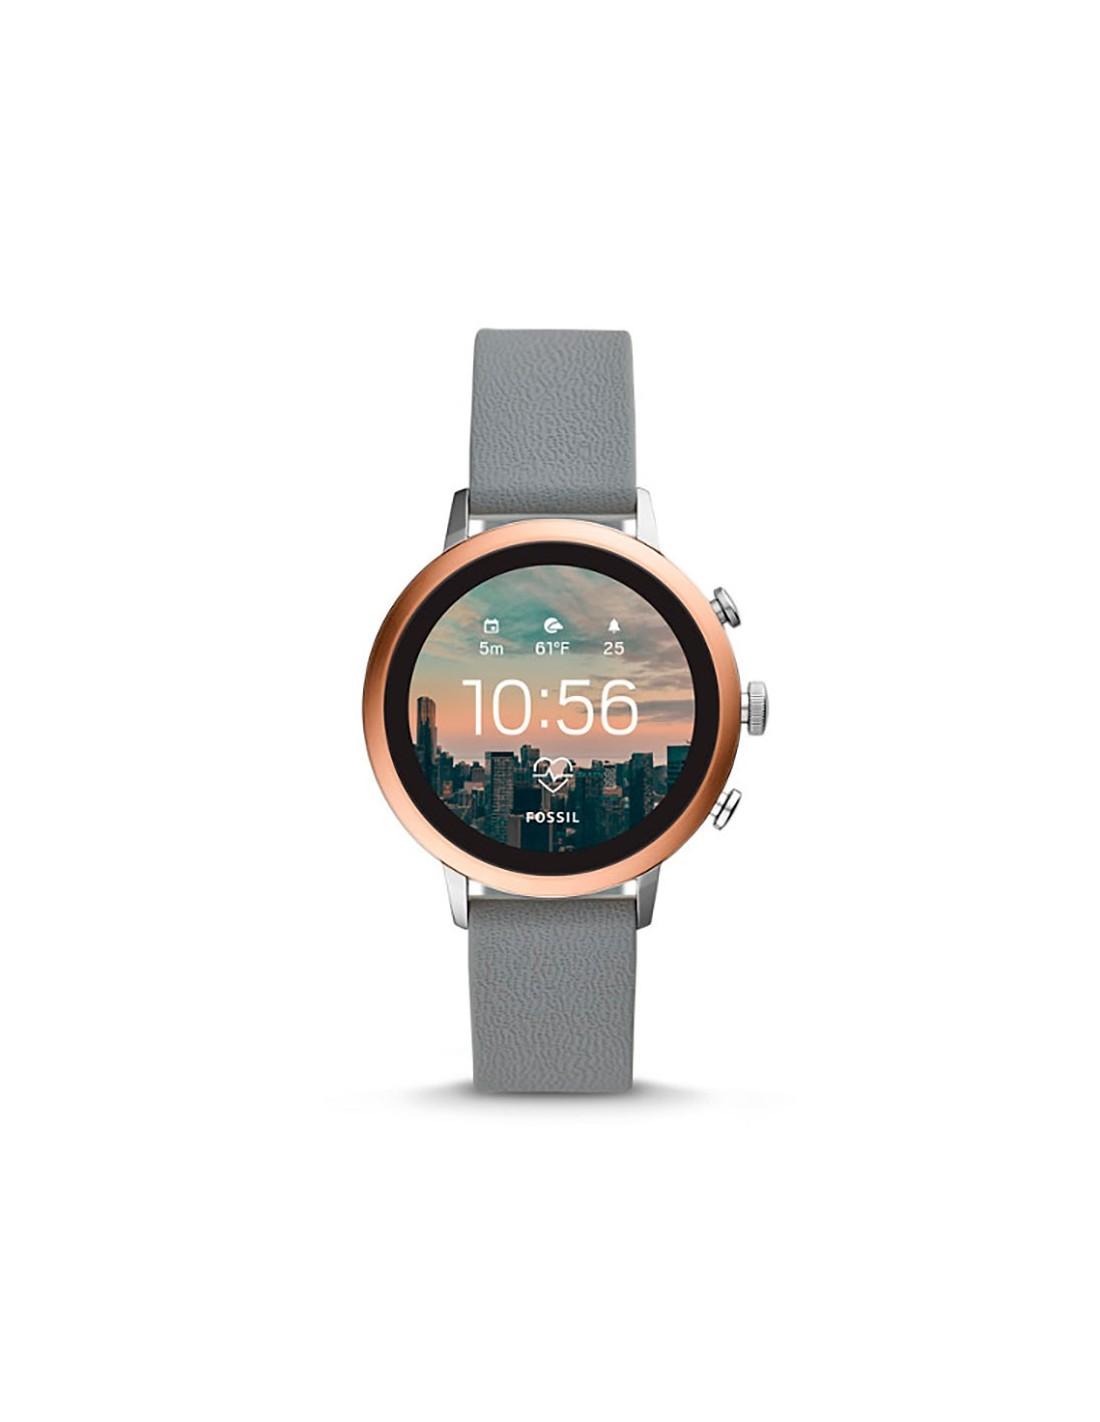 b82738e4d4c8 ... Reloj FTW6016 Fossil Smartwatch